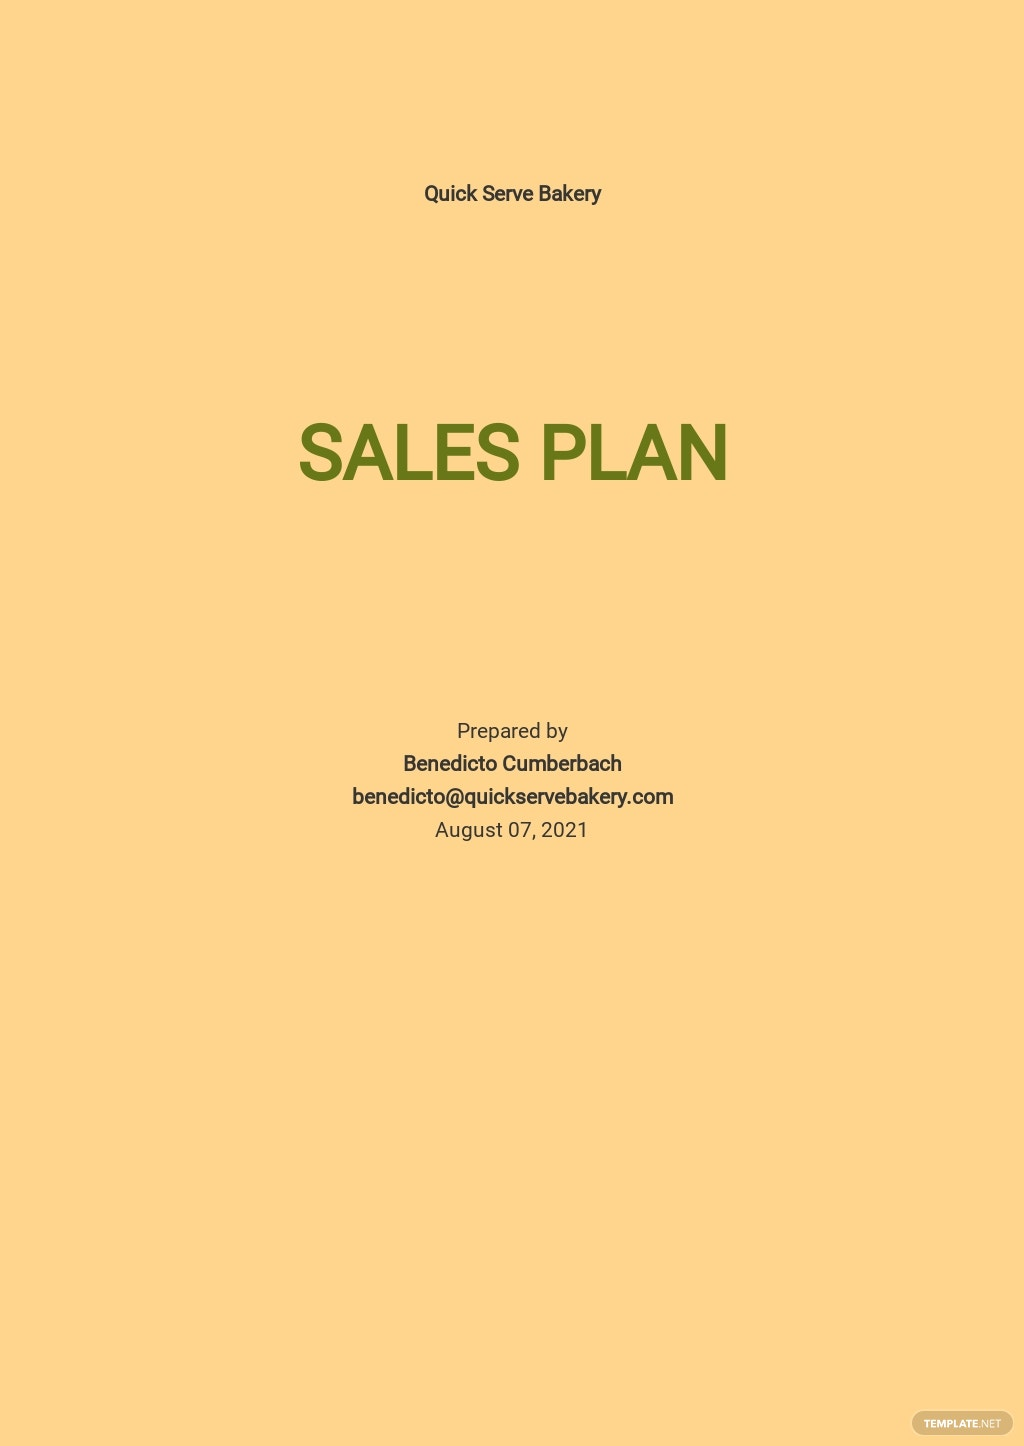 Bakery Sales Plan Template